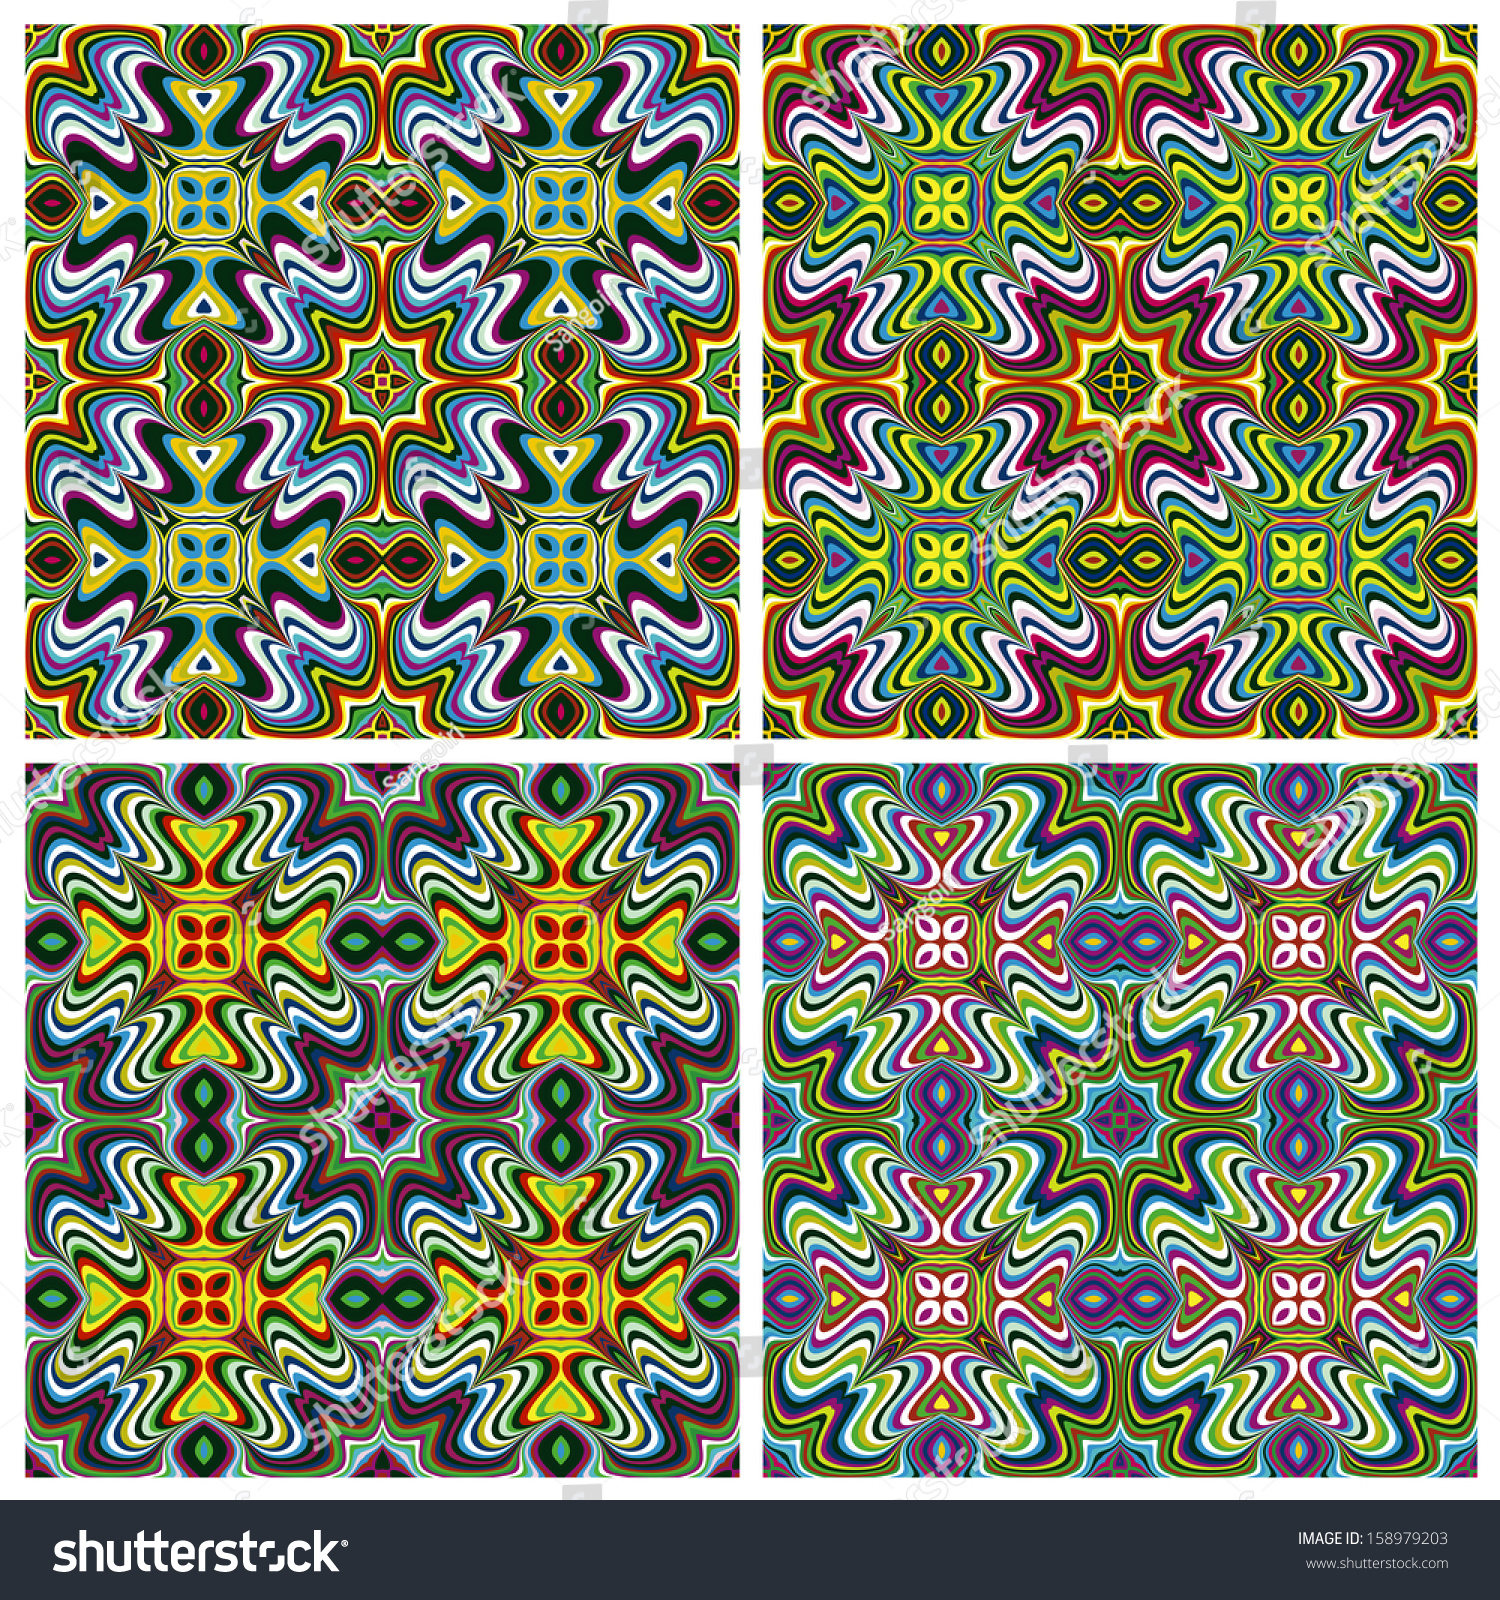 Modern Indian Textile Design With Spiritual Symbols One Pattern